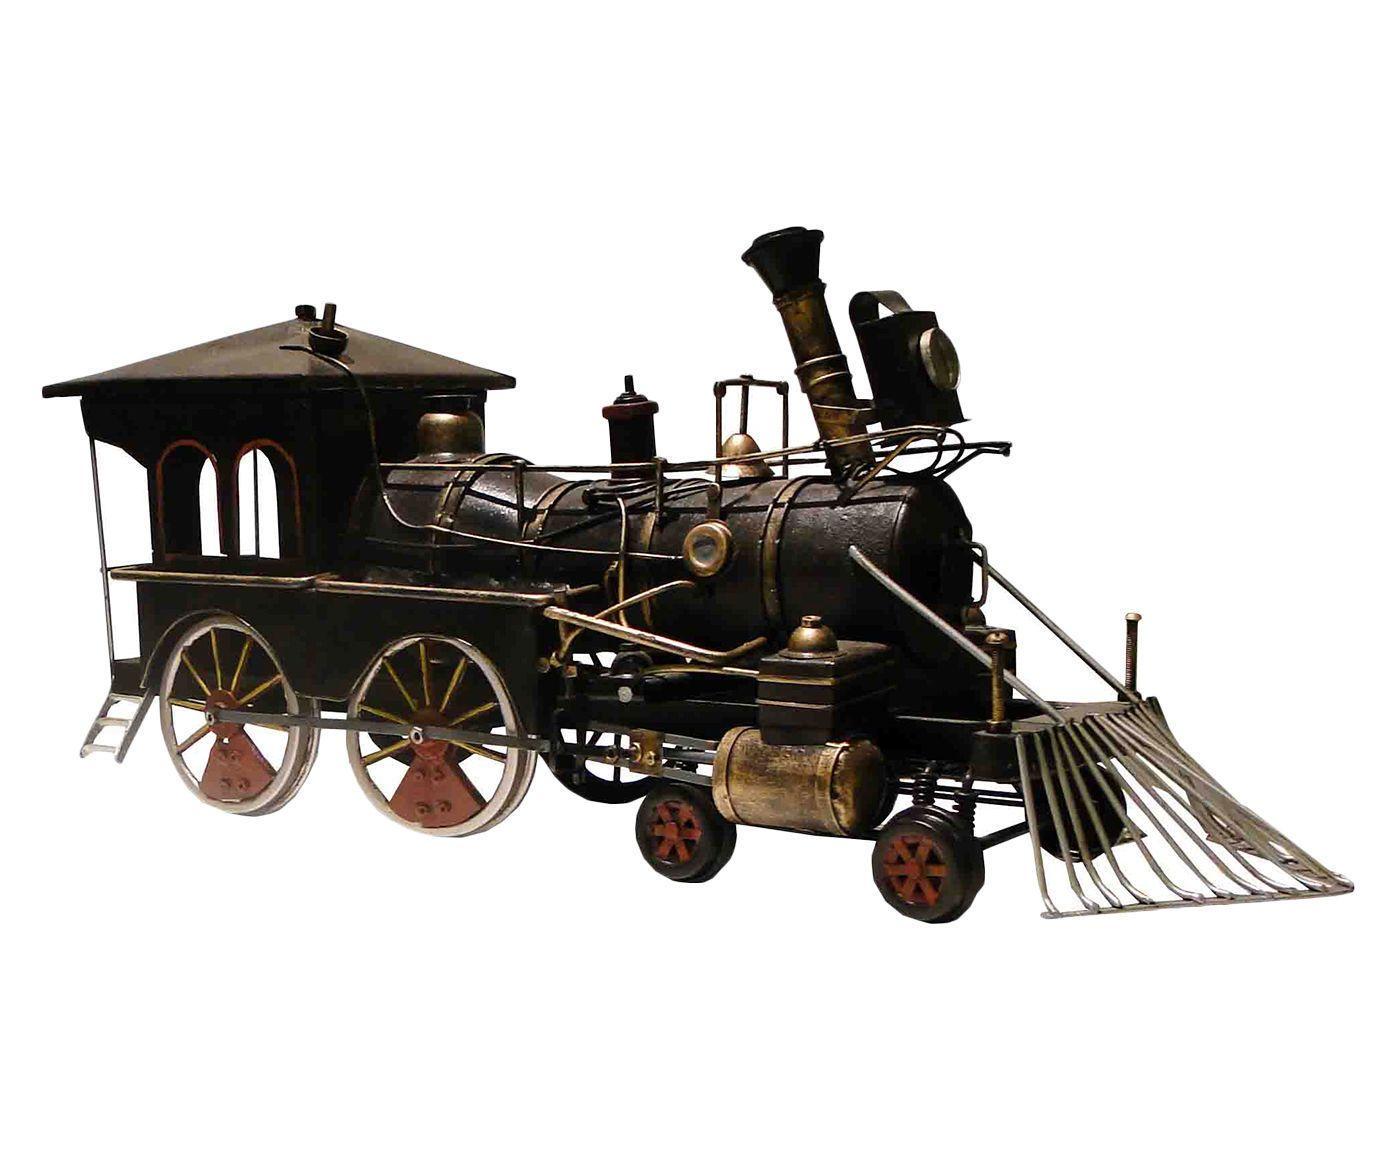 Miniatura Locomotiva American Steam Oldway | Westwing.com.br